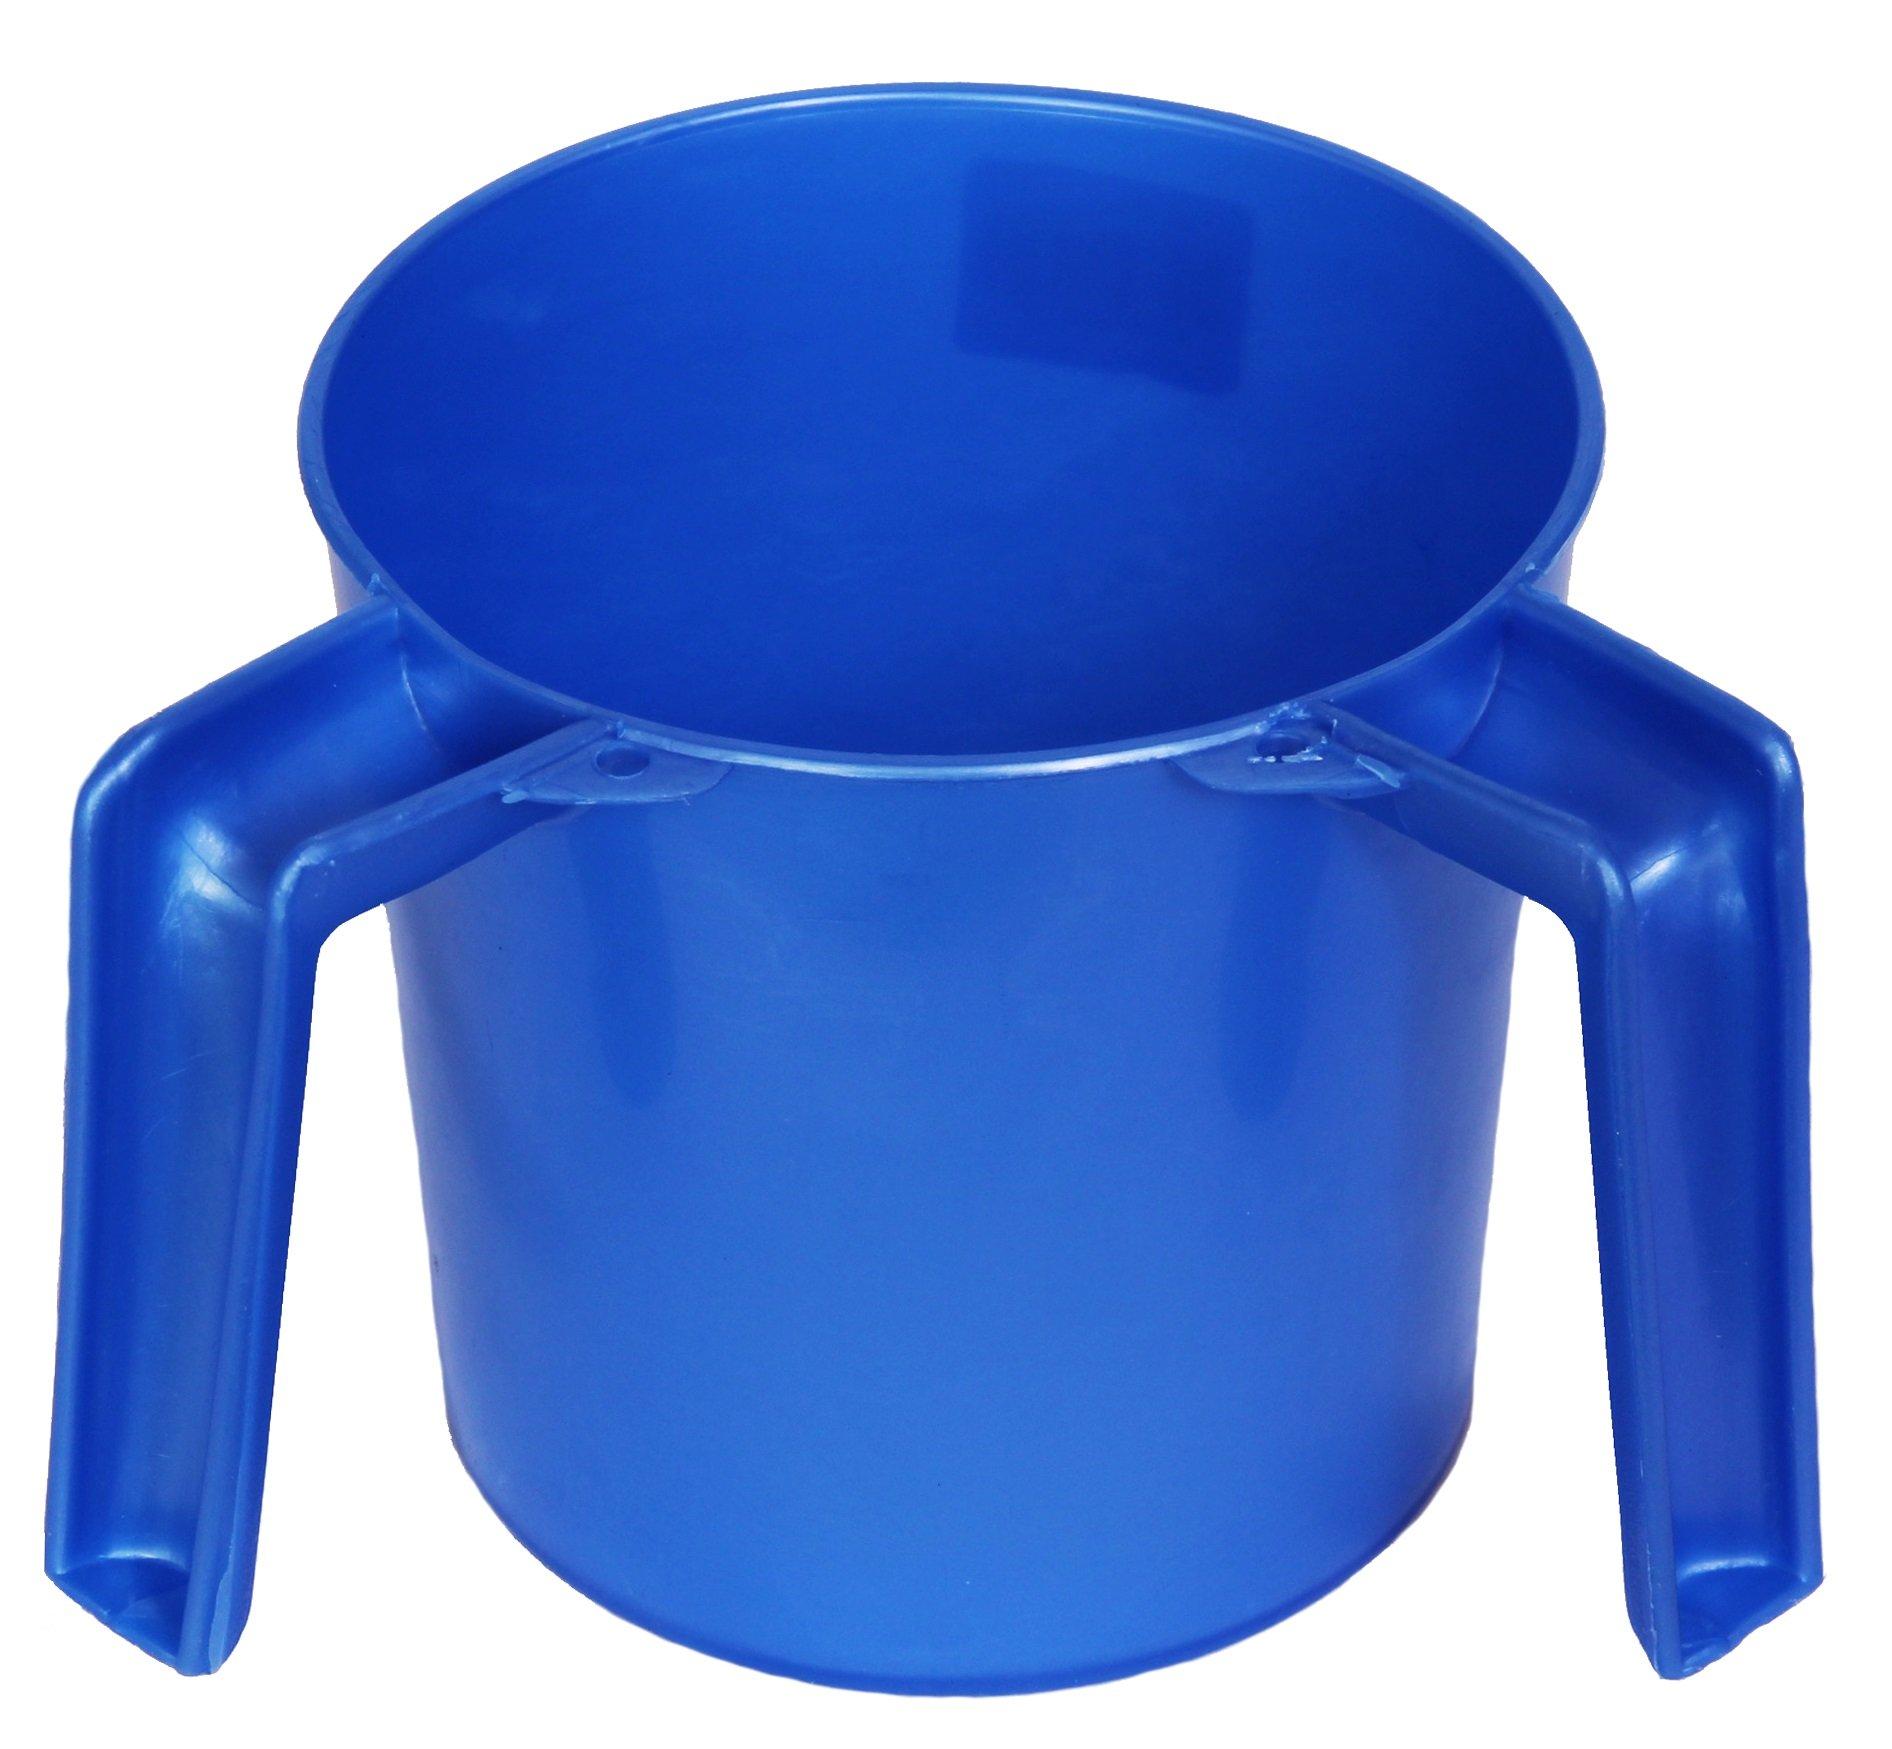 Ybm Home Plastic Round Wash Cup Ba157 (4, blue)